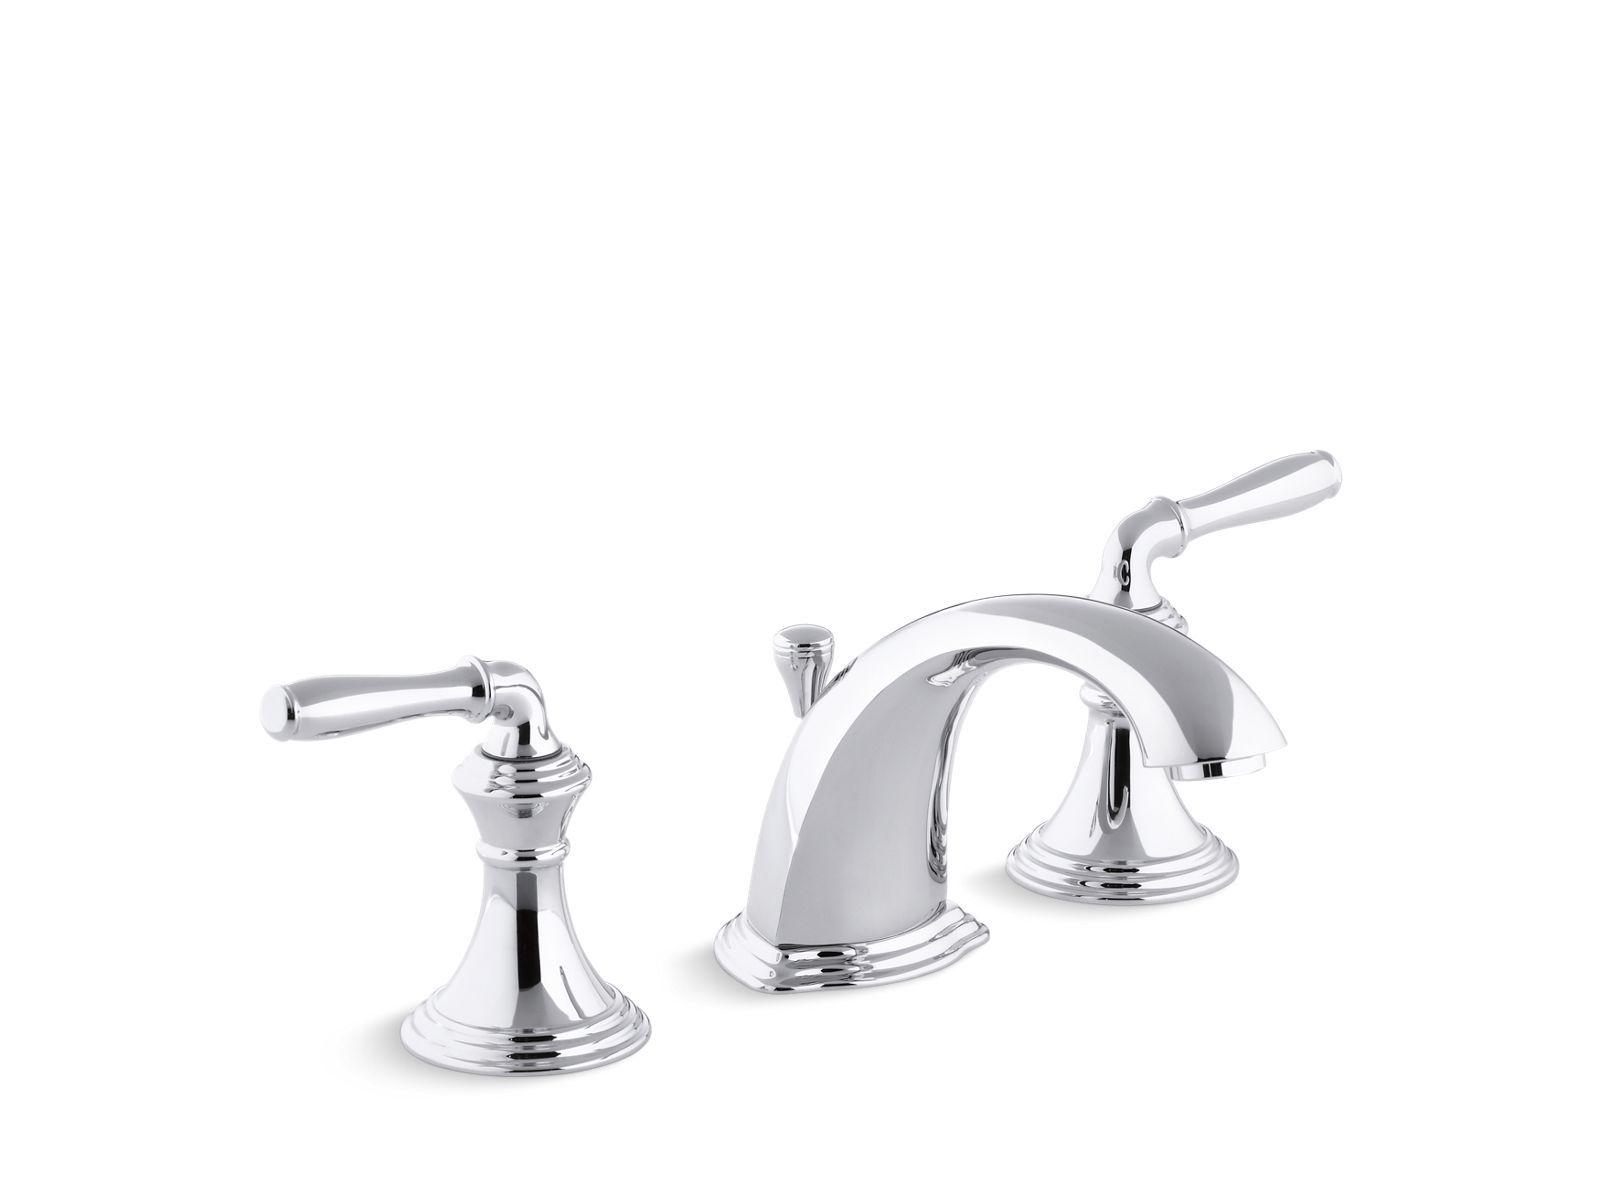 K 394 4 Devonshire Widespread Sink Faucet With Lever Handles Kohler Sink Faucets Widespread Bathroom Faucet Bathroom Sink Faucets